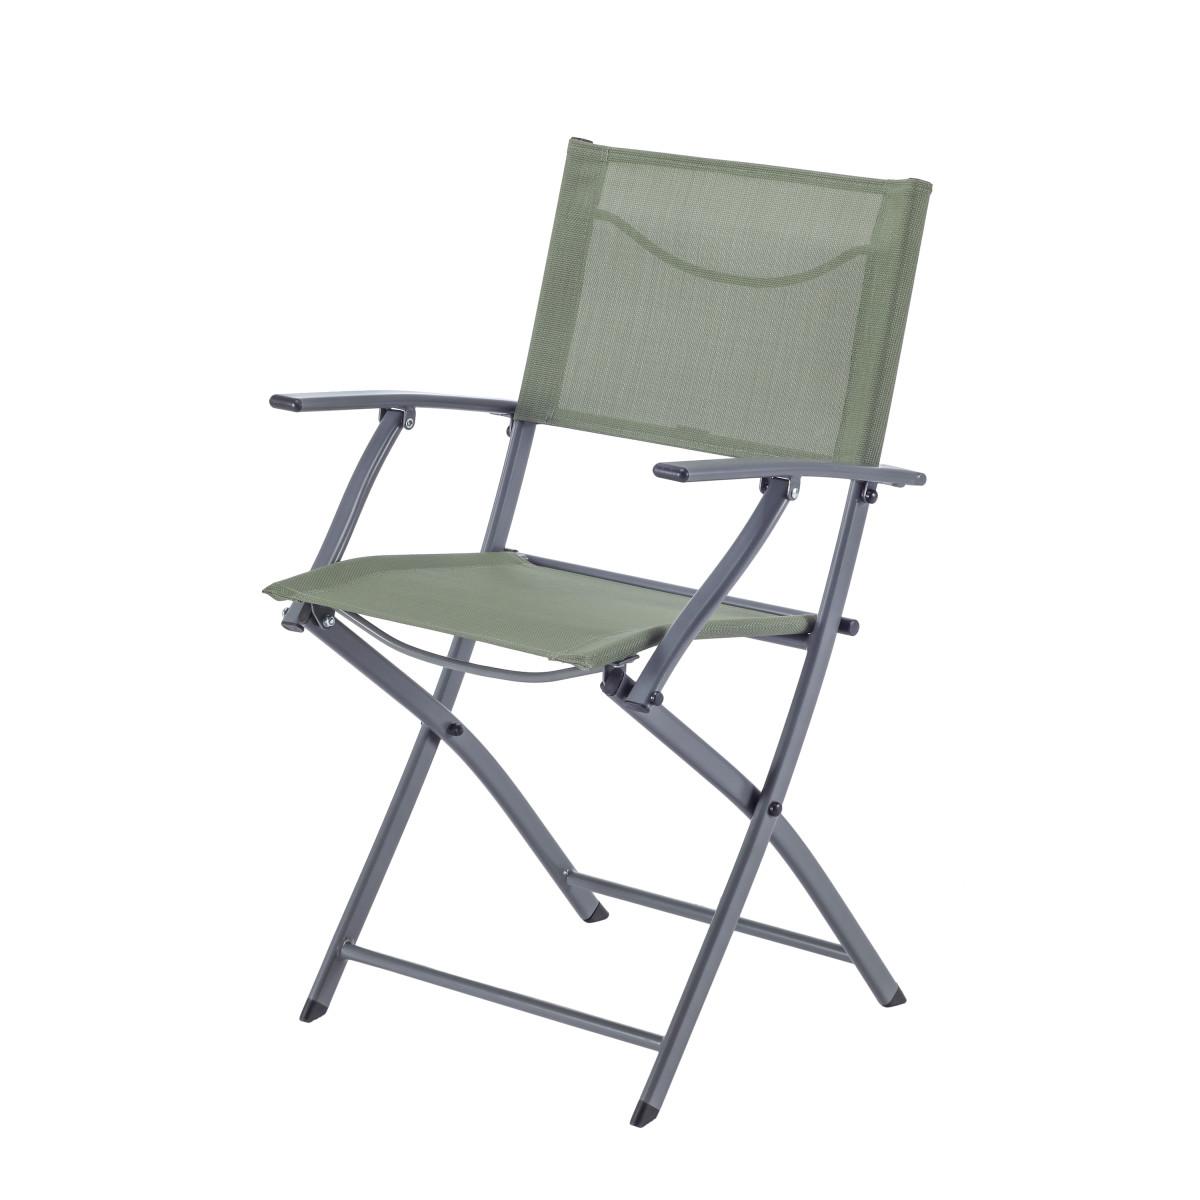 Кресло Naterial Emys Origami складное 54х52х83 см сталь зеленый